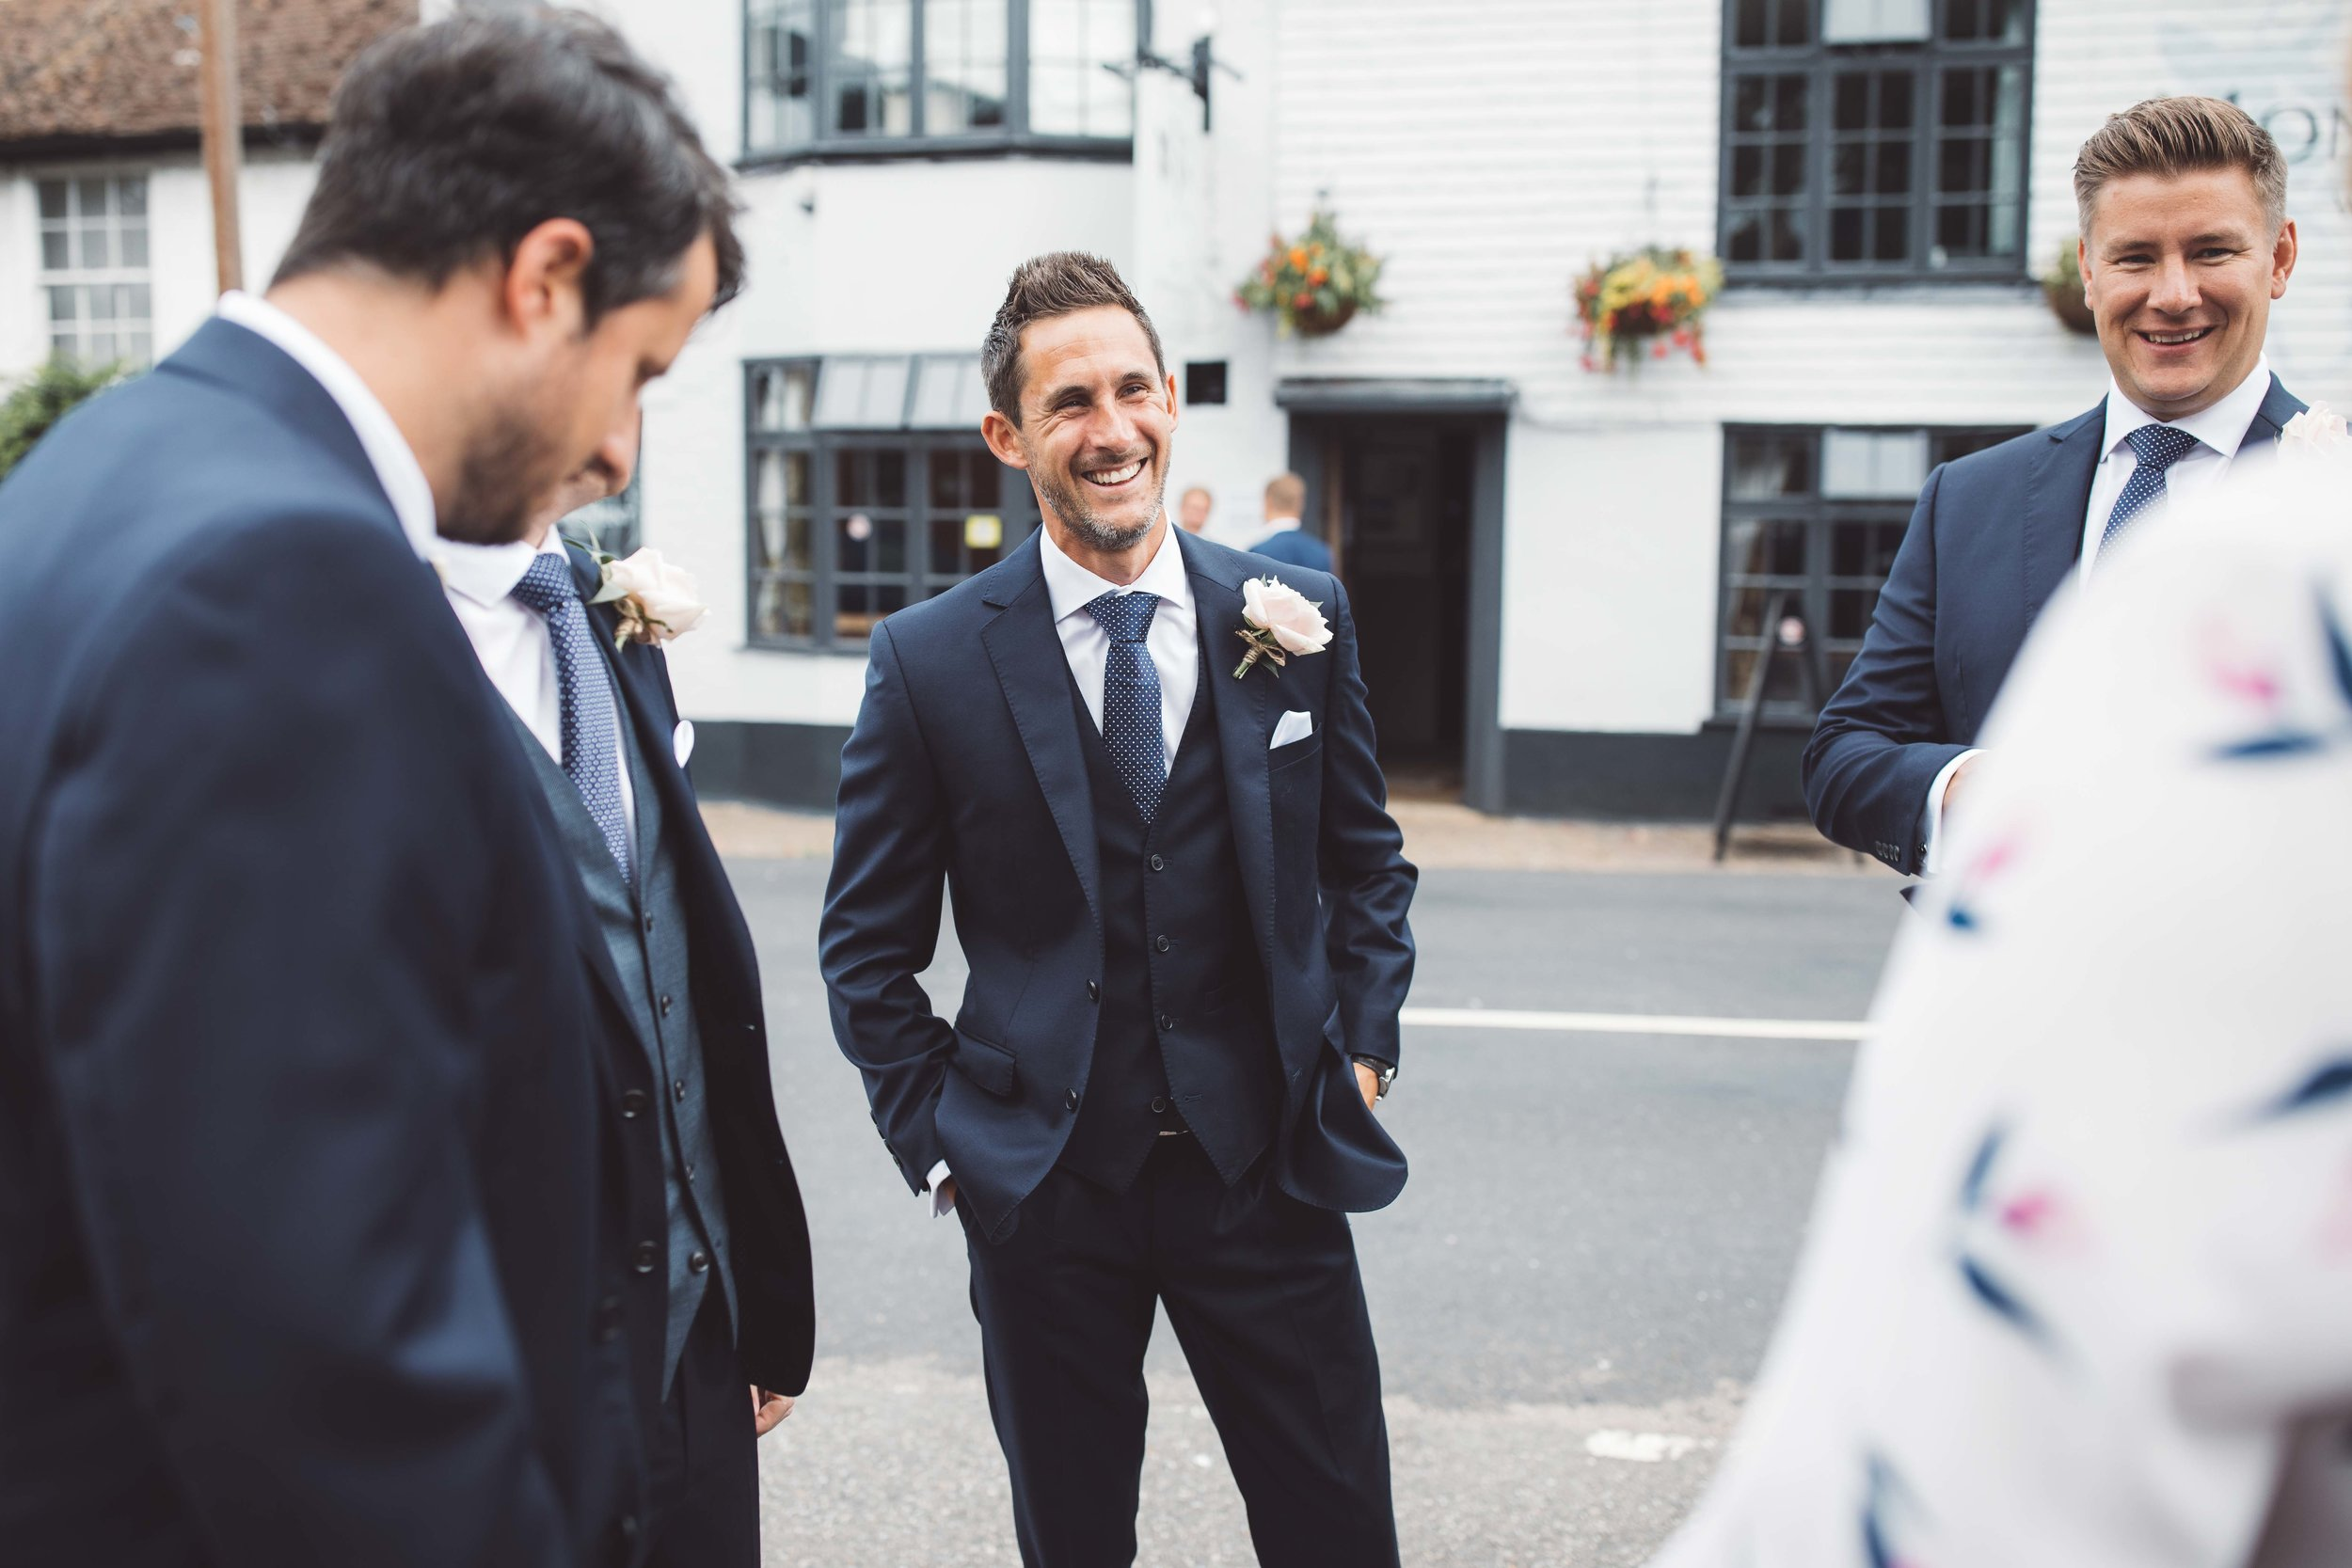 CraigChristine Boughton Golf Course Wedding-14.jpg